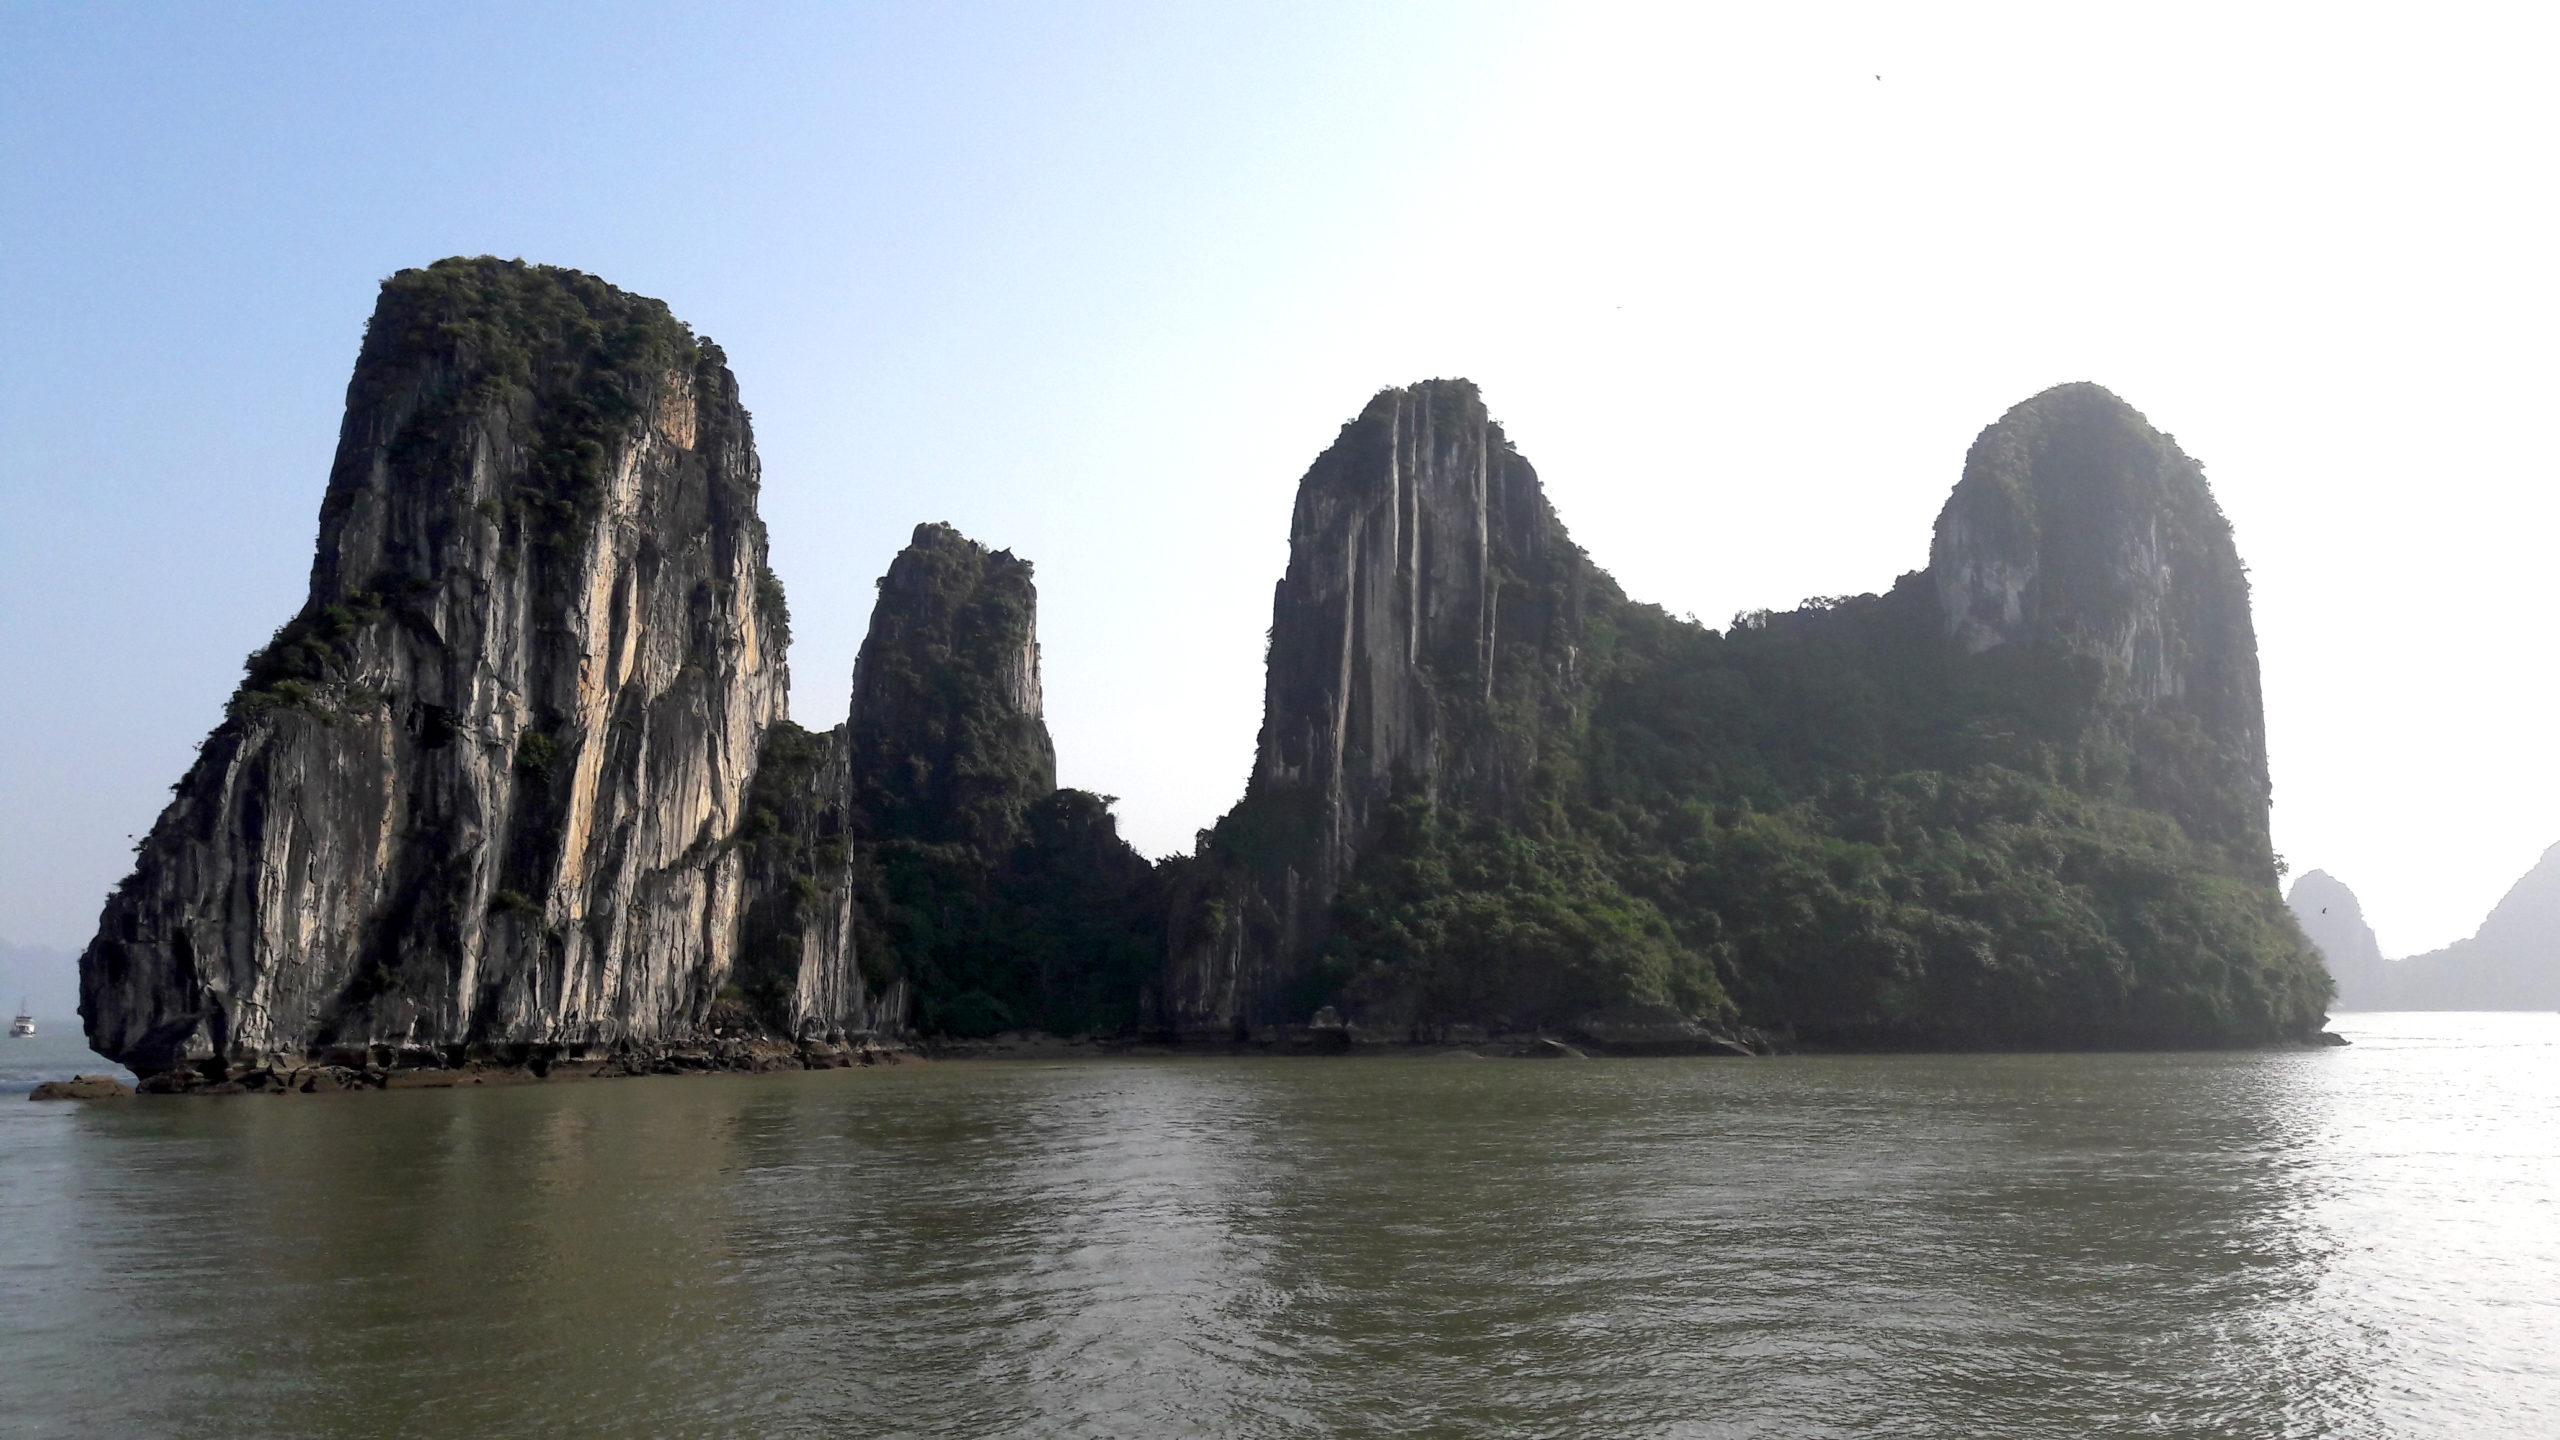 Kalksteinfelsen in der Ha-Long-Bay in Vietnam